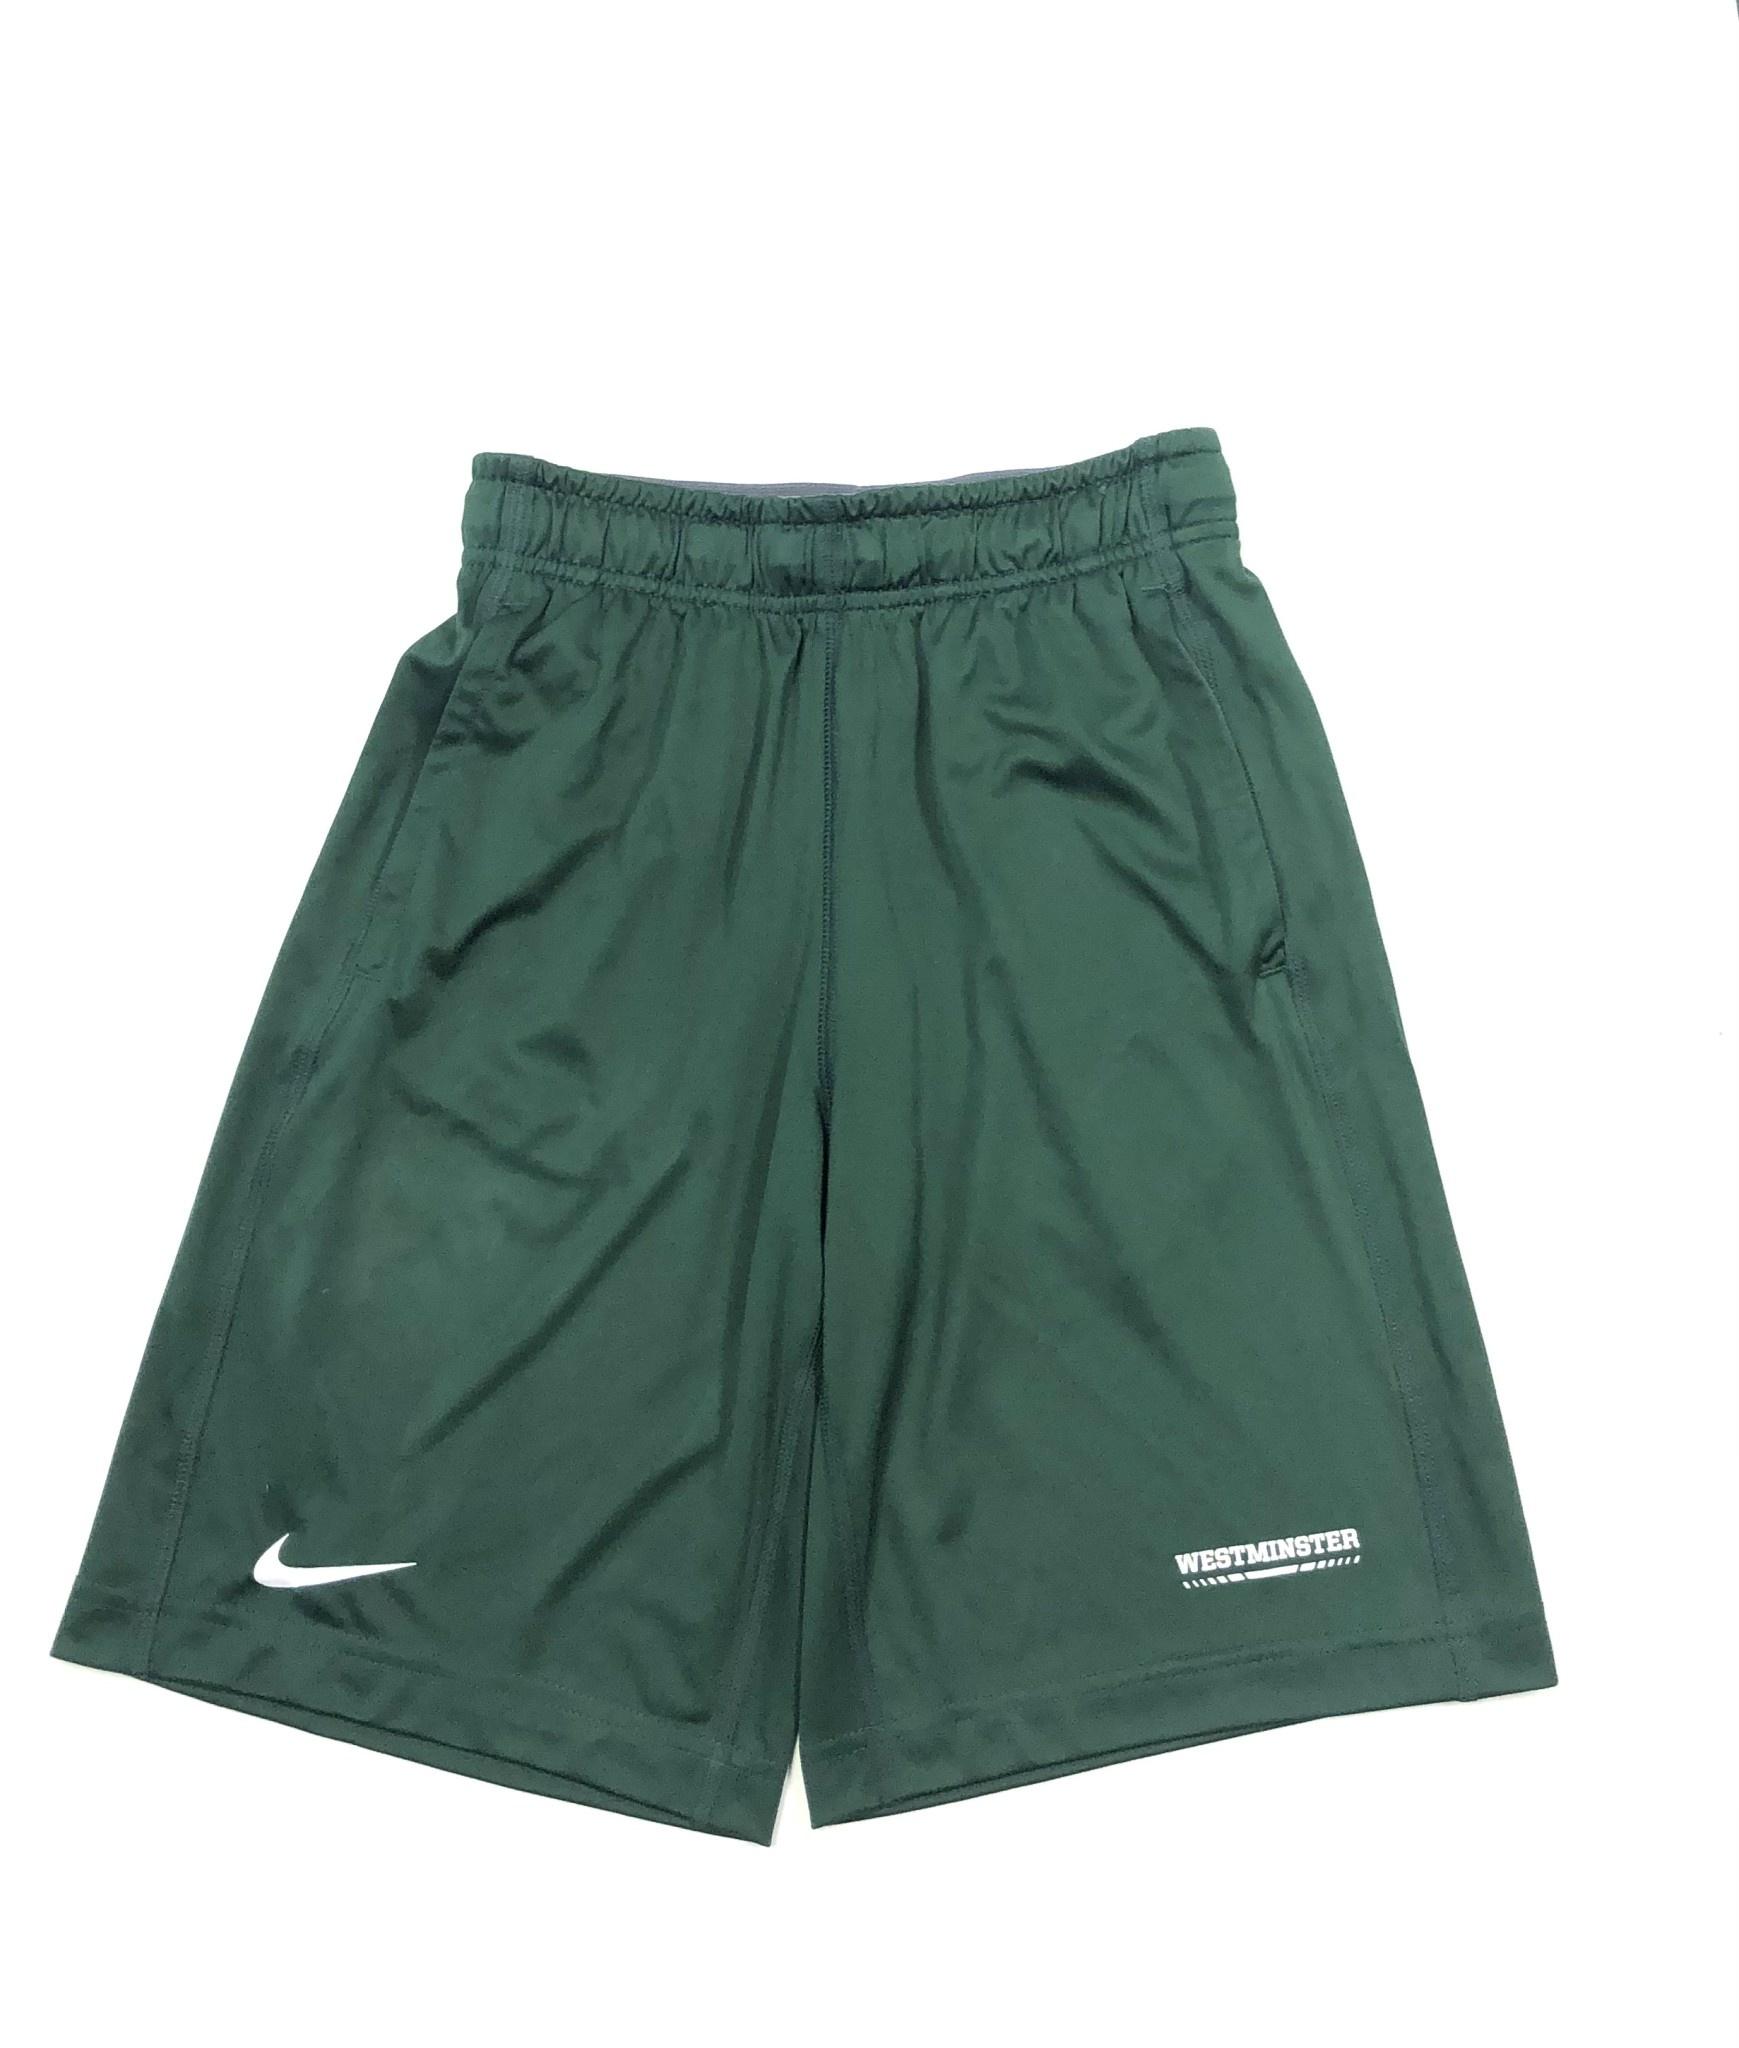 Nike Shorts: Nike Fly - Green Youth